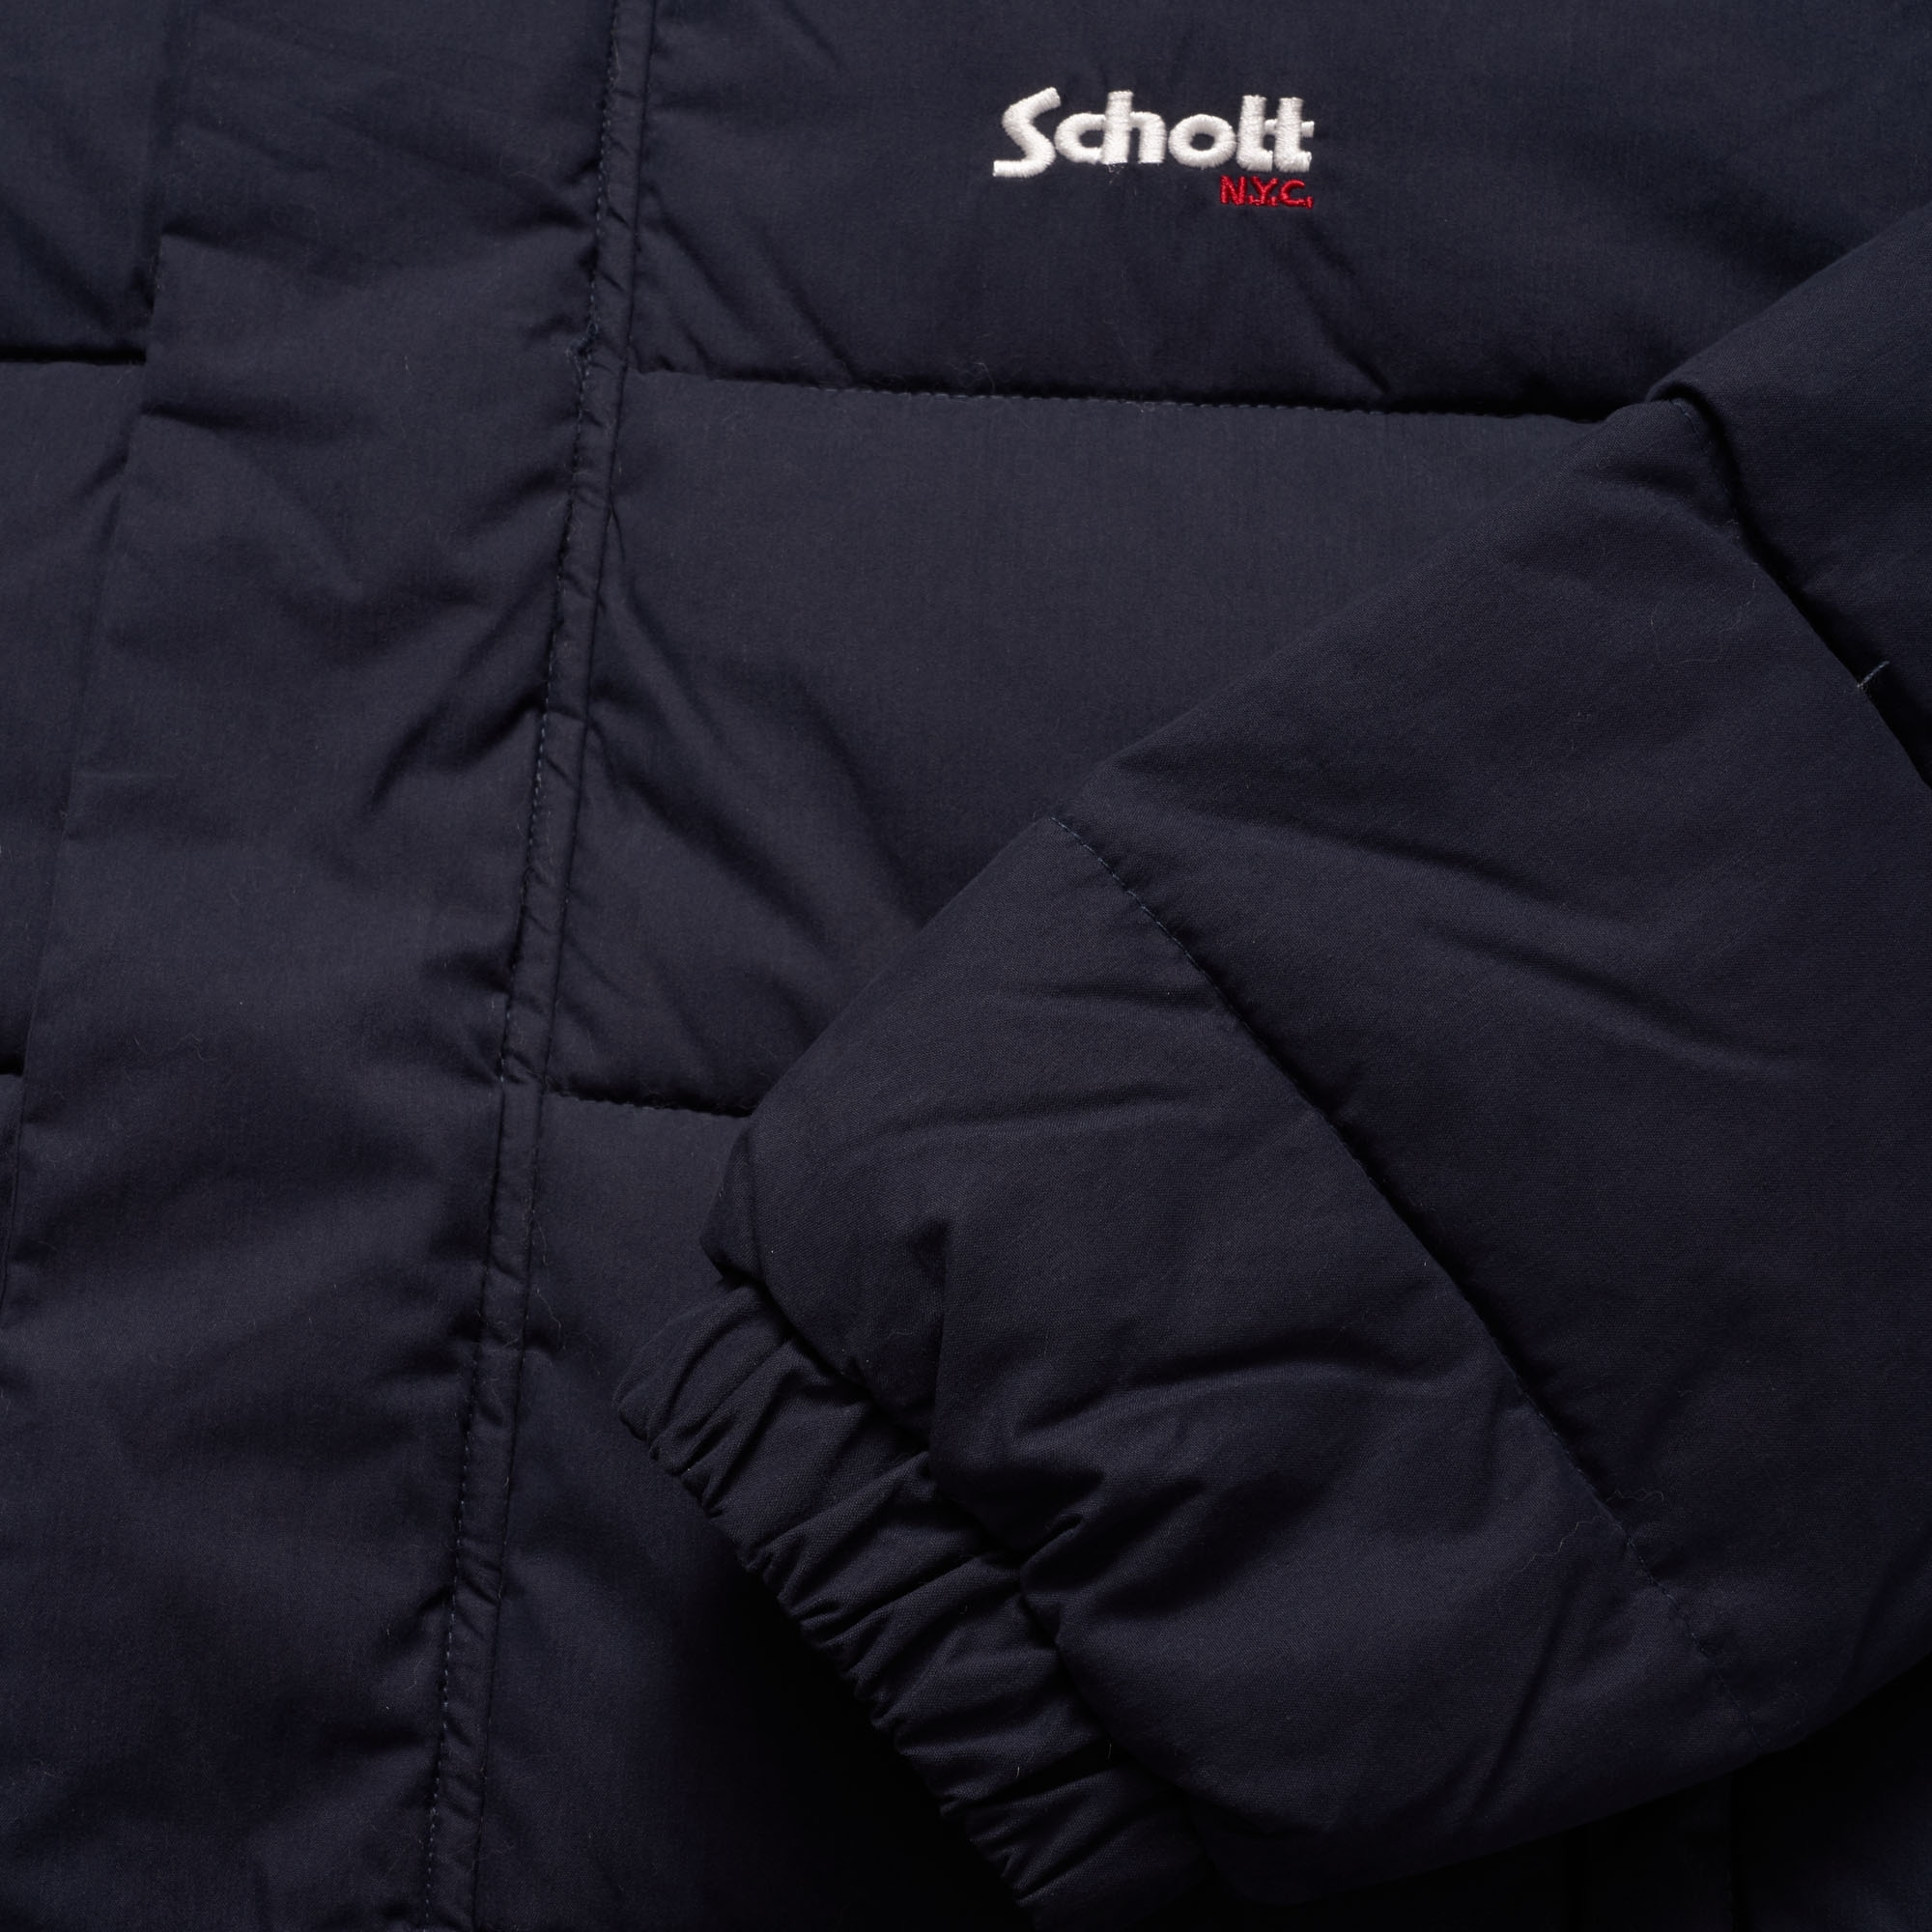 Schott NYC Nebraska Jacket Homme